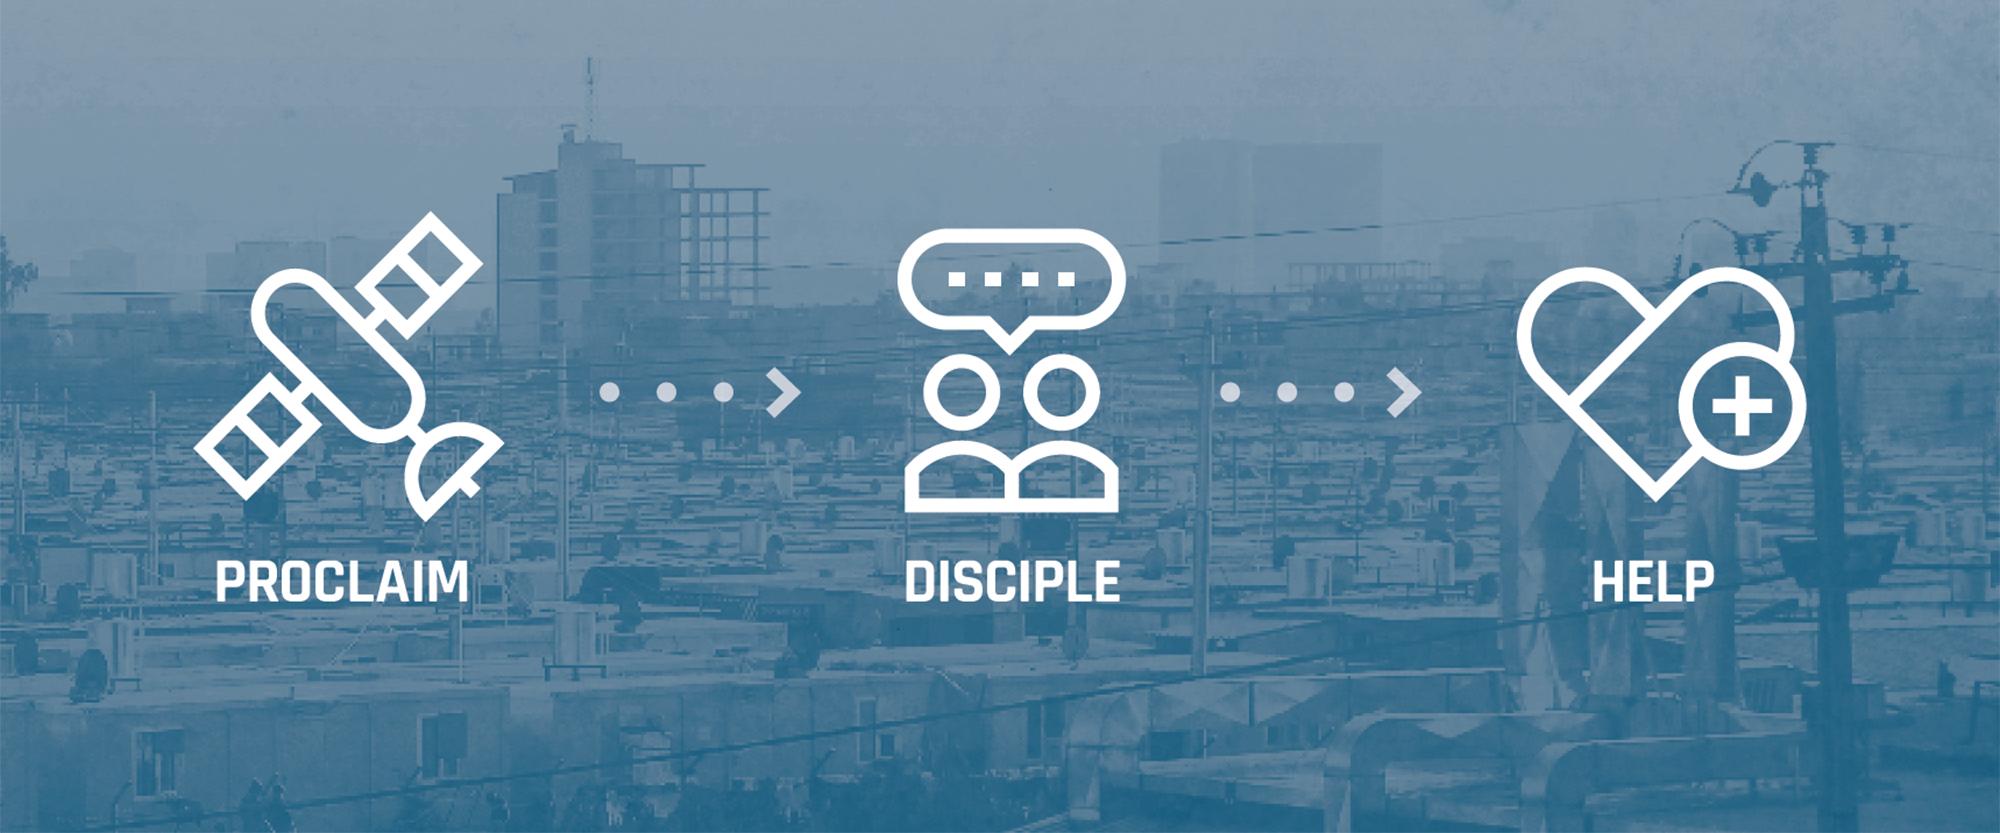 Proclaim, Disciple, Help